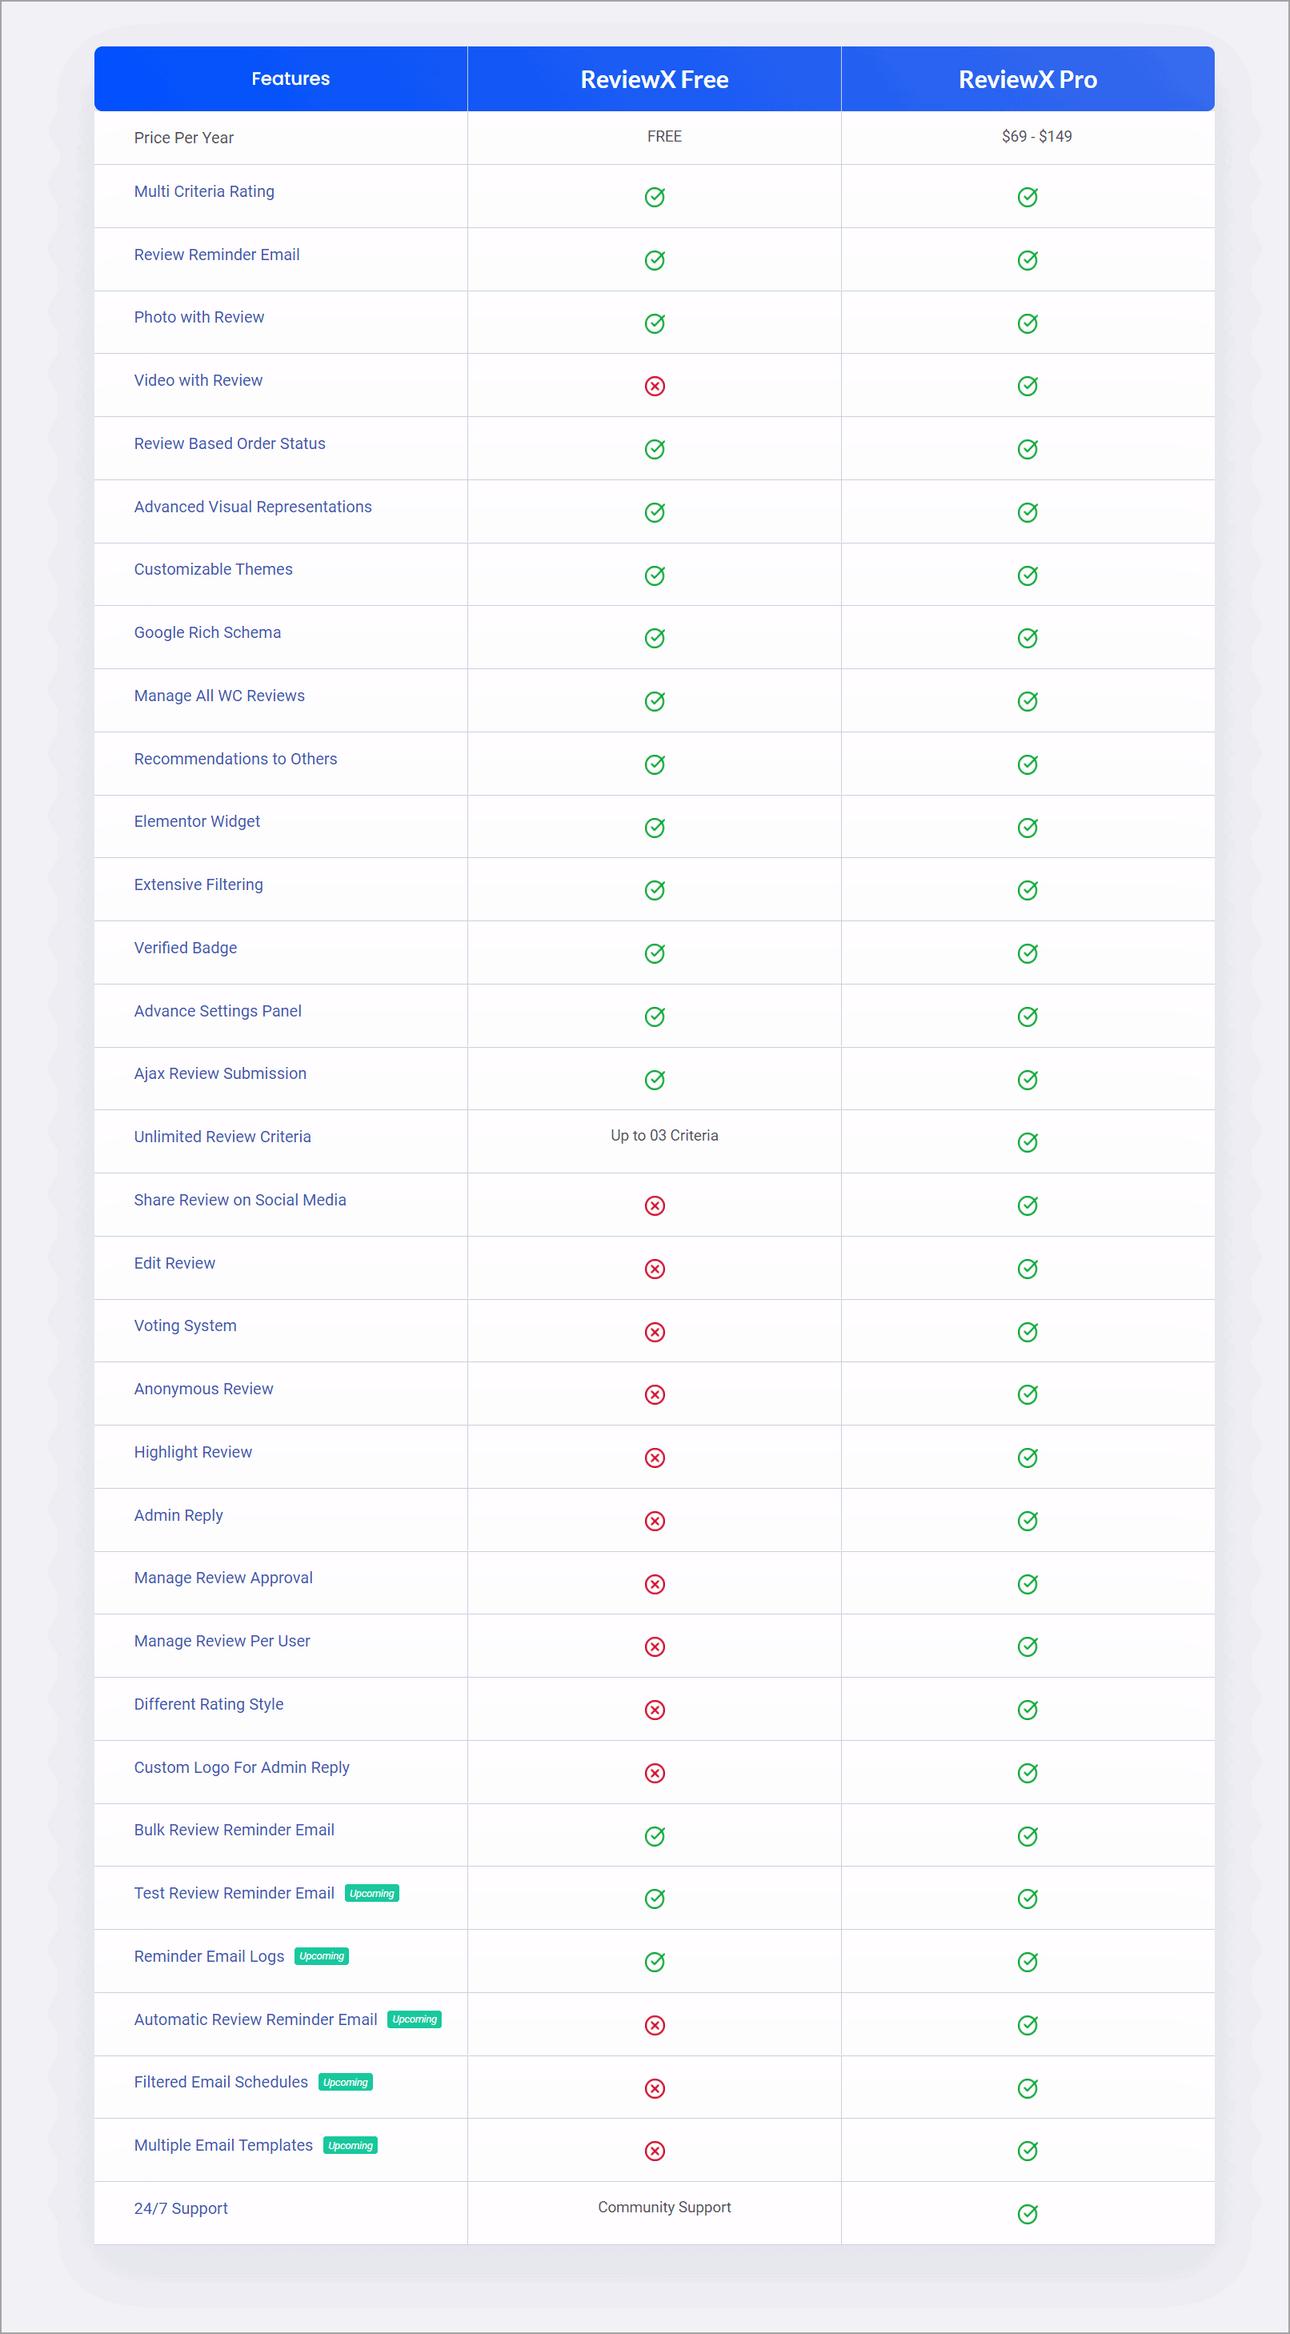 Reviewx Free Vs Pro